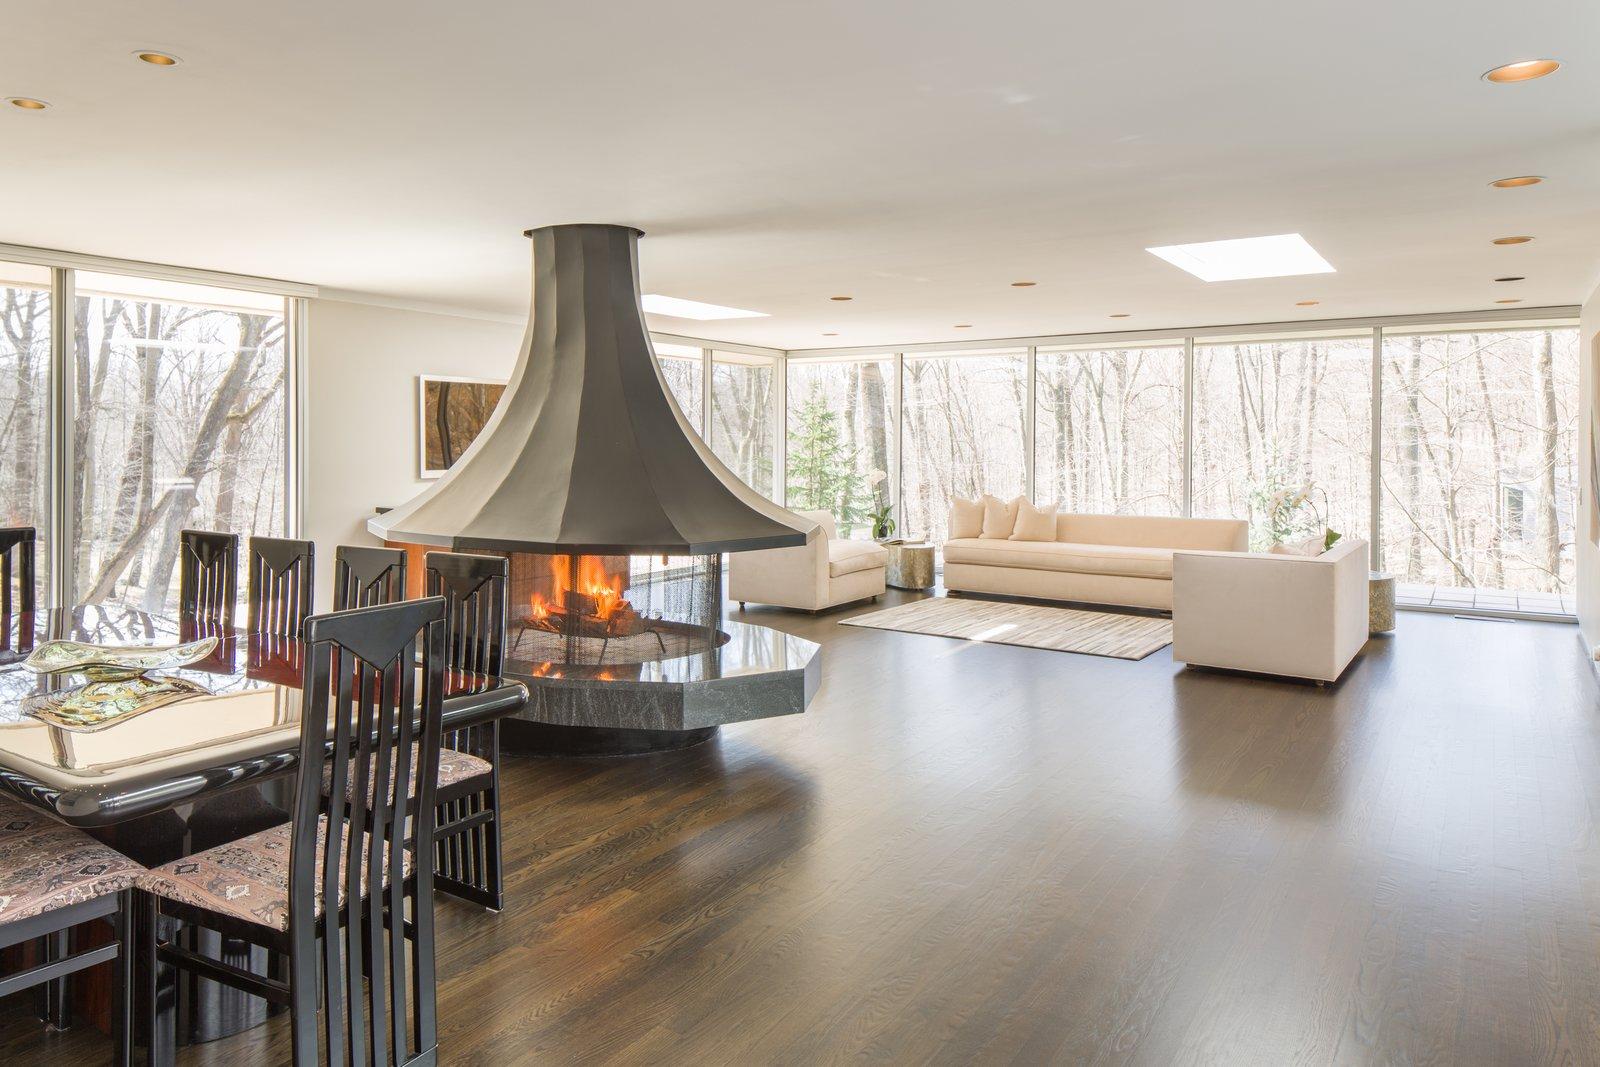 Skidmore, Owings & Merrill midcentury home fireplace